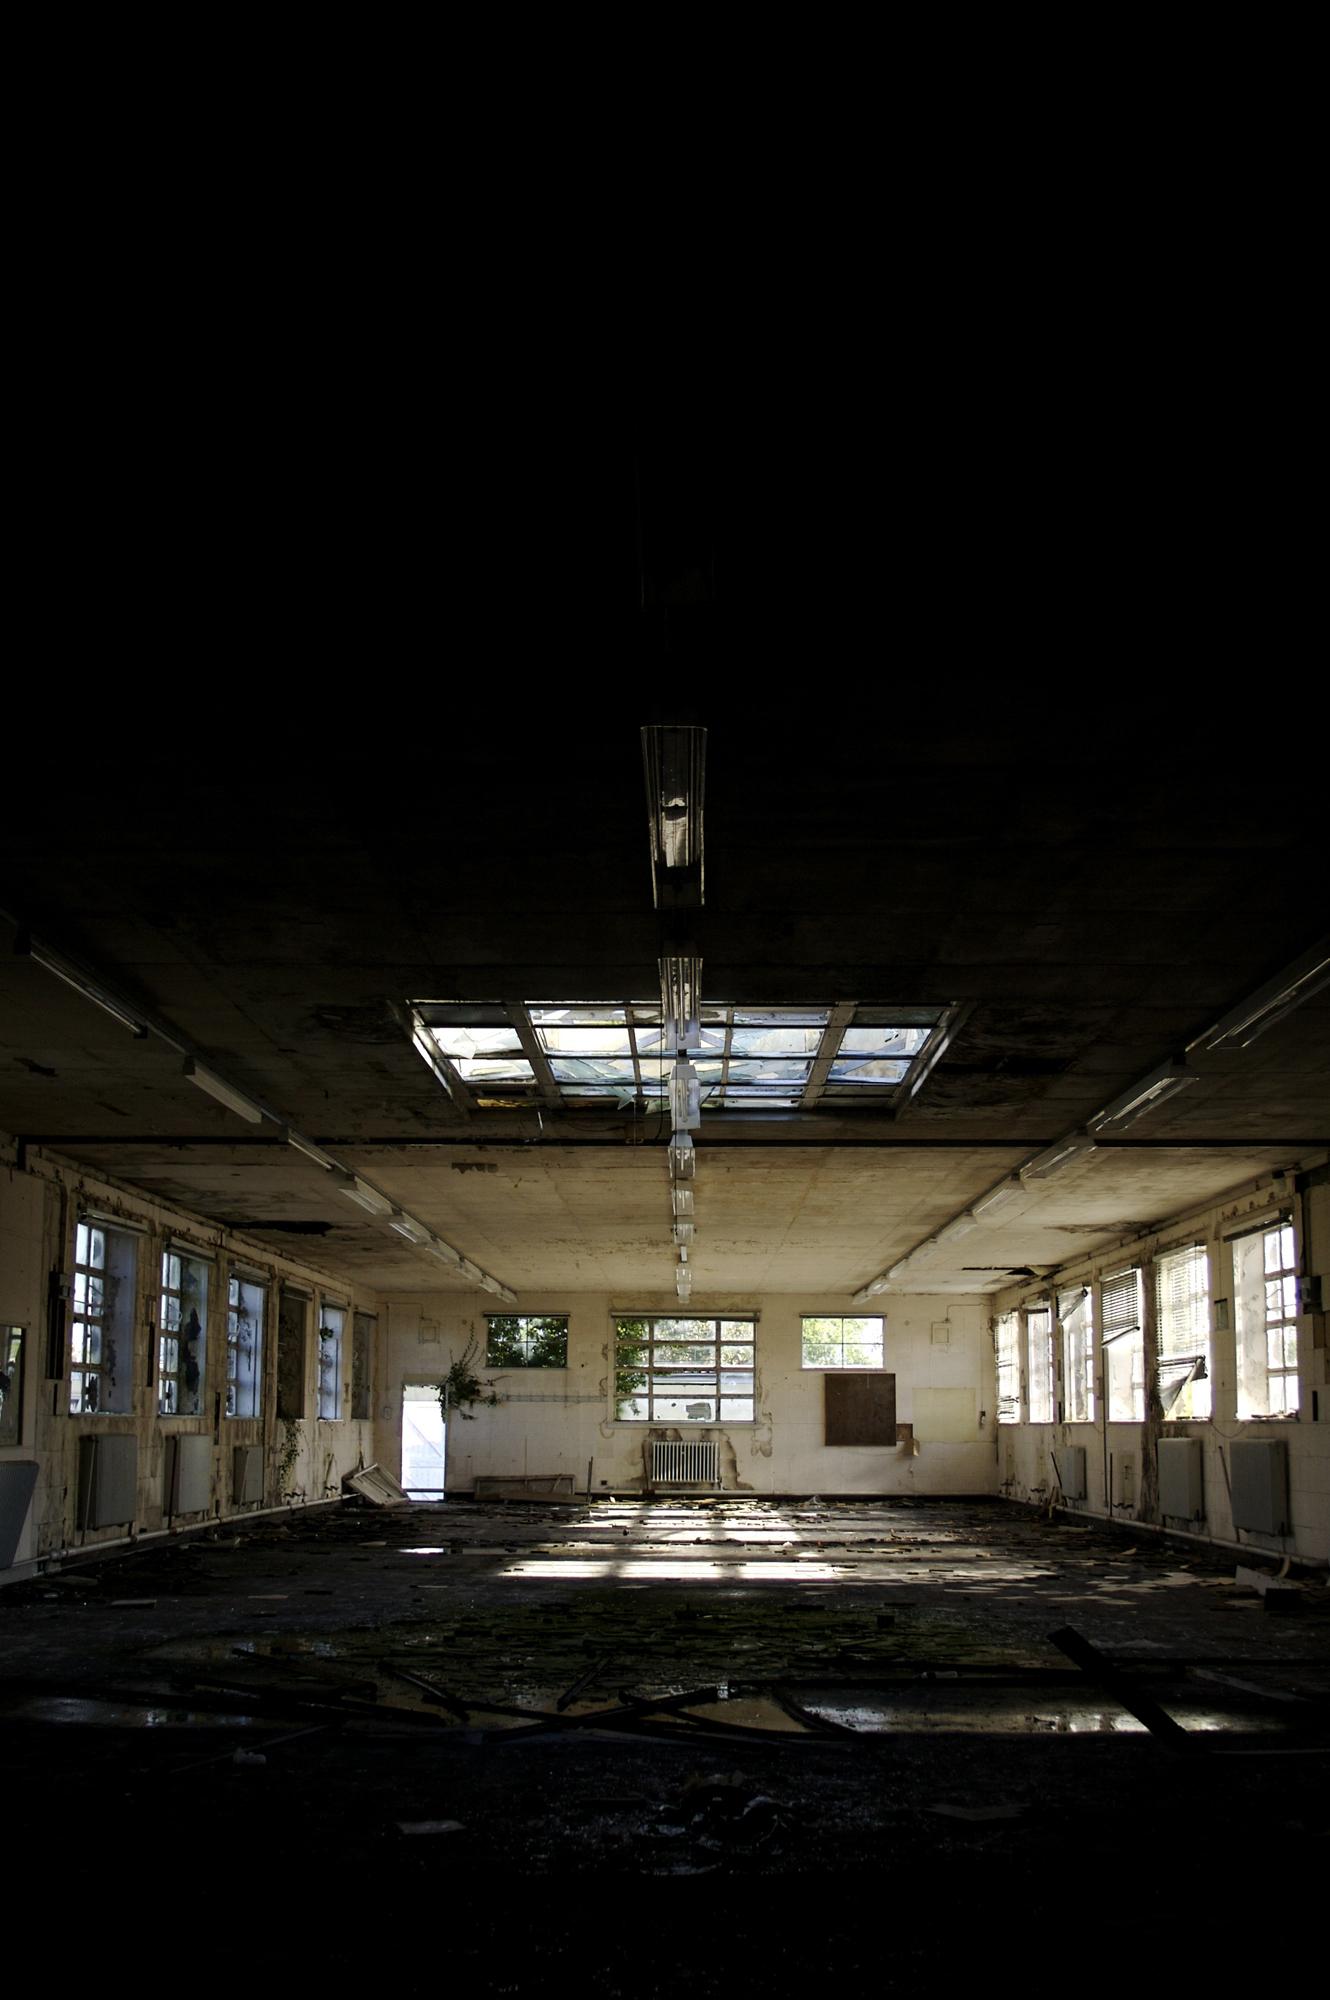 Big Room, Abandoned, Bspo06, Building, Dark, HQ Photo